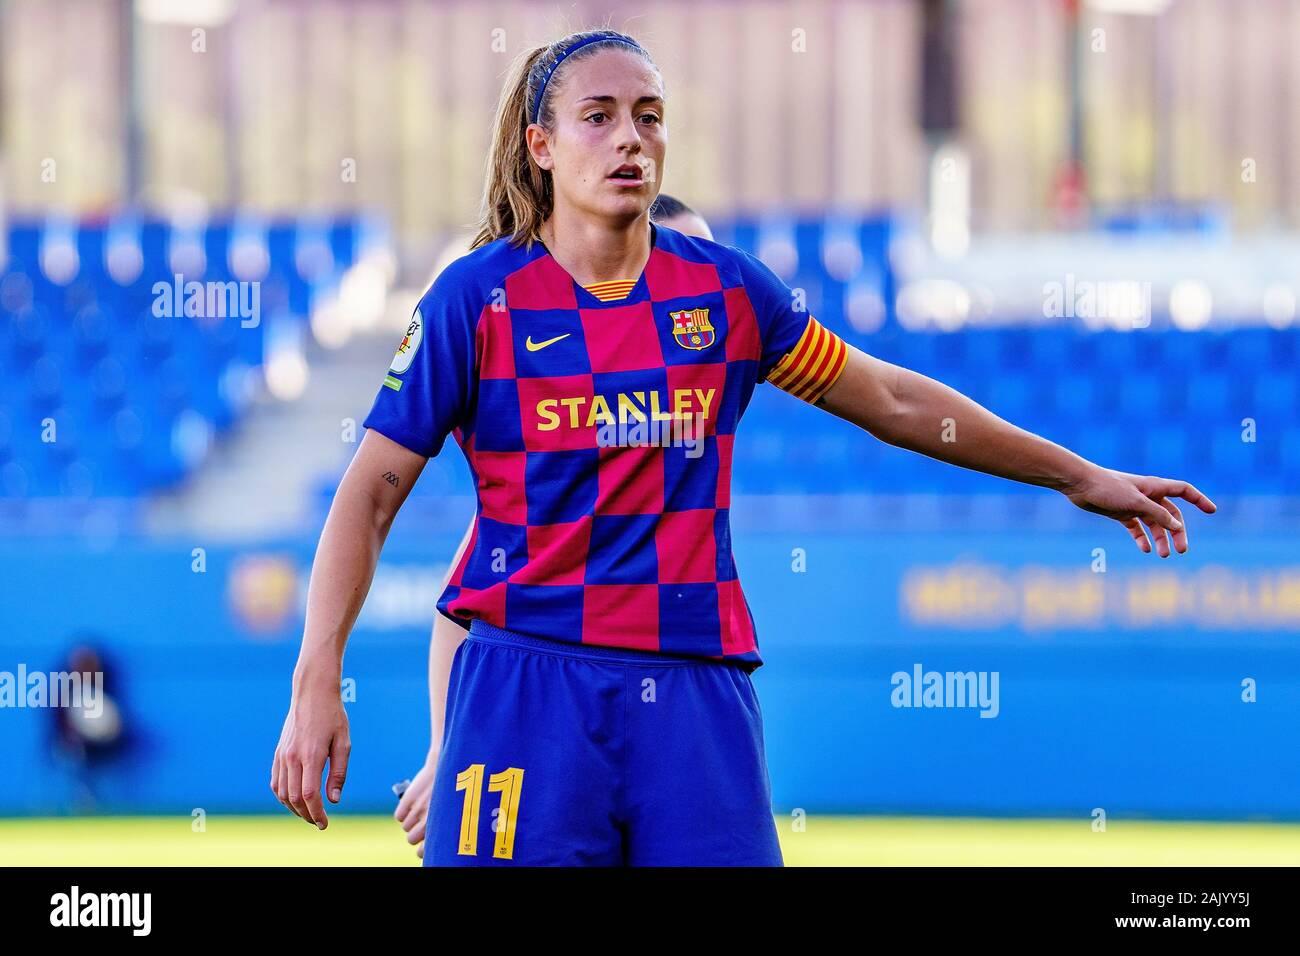 Barcelona Dec 21 Alexia Putellas Plays At The Spanish Women League Match Between Fc Barcelona Feminine And Tenerife At The Johan Cruyff Stadium On Stock Photo Alamy